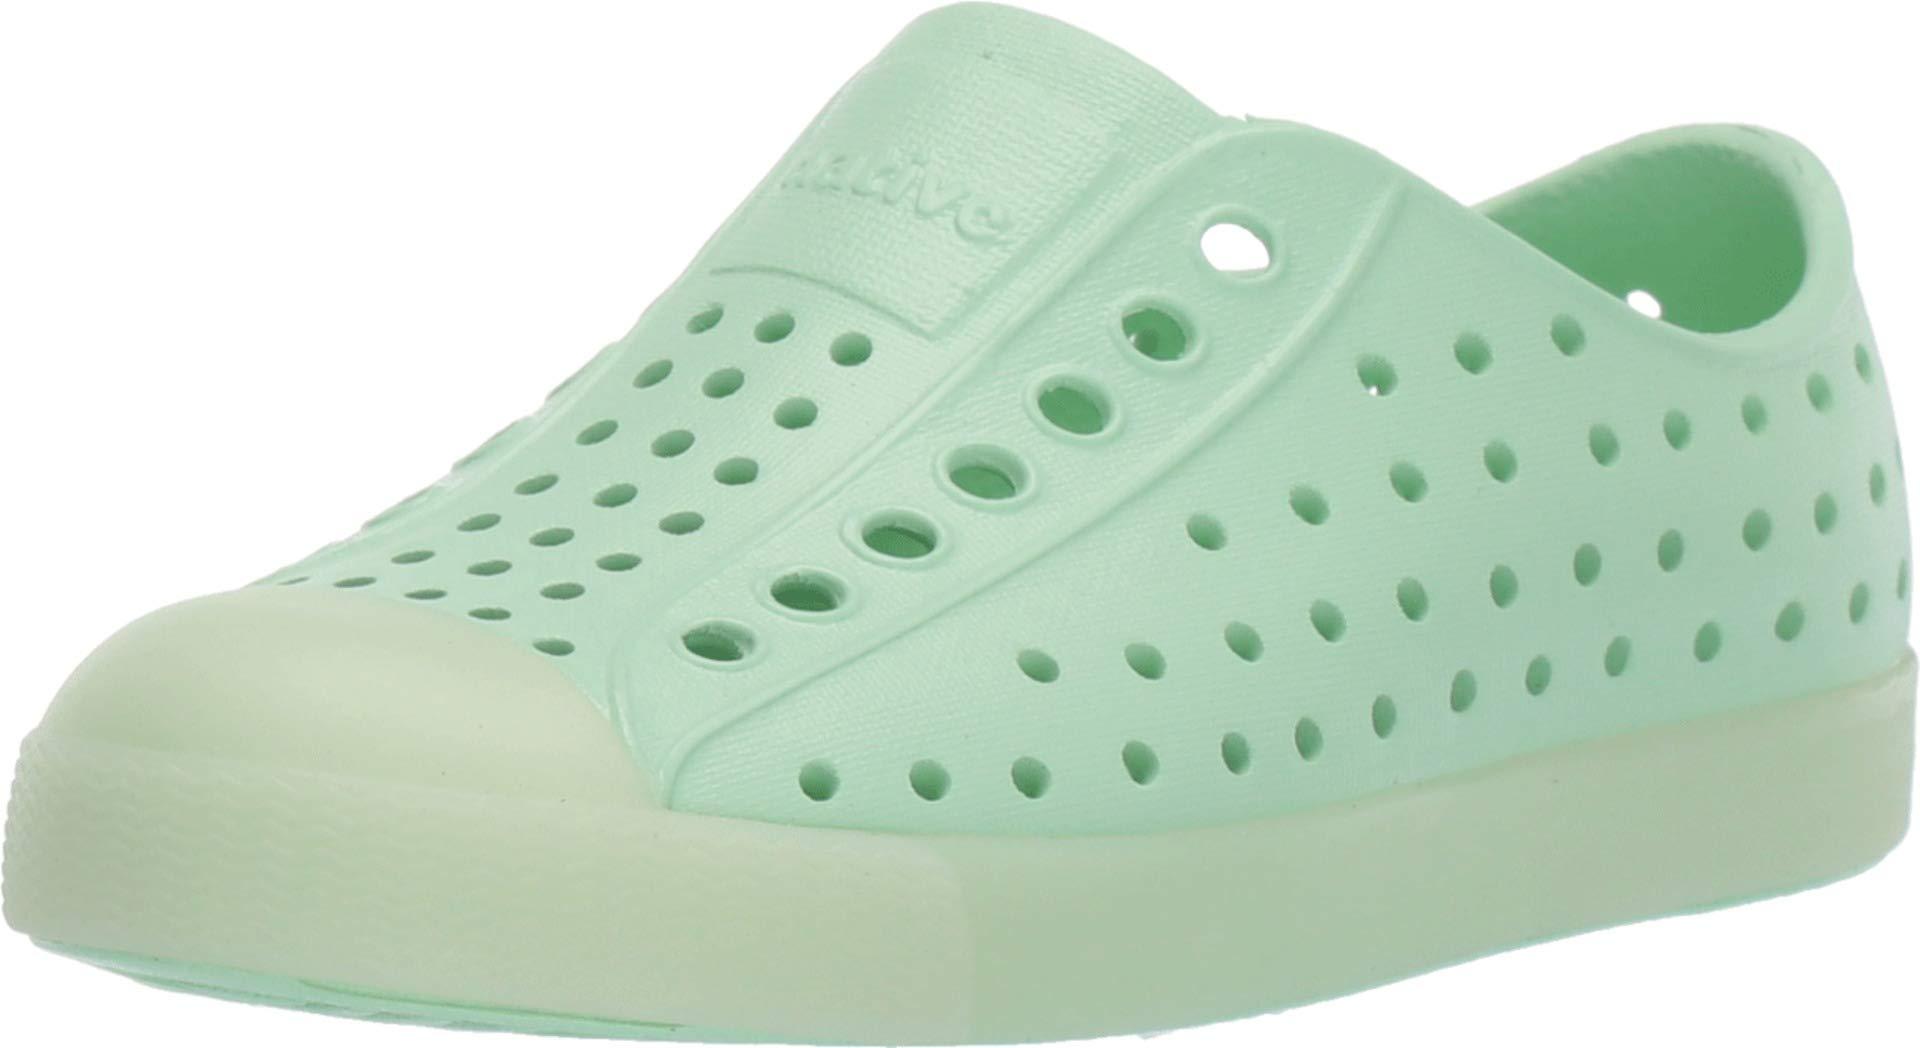 Native Kids Shoes Baby Girl's Jefferson (Toddler/Little Kid) Celtuse Green/Glow 4 M US Toddler